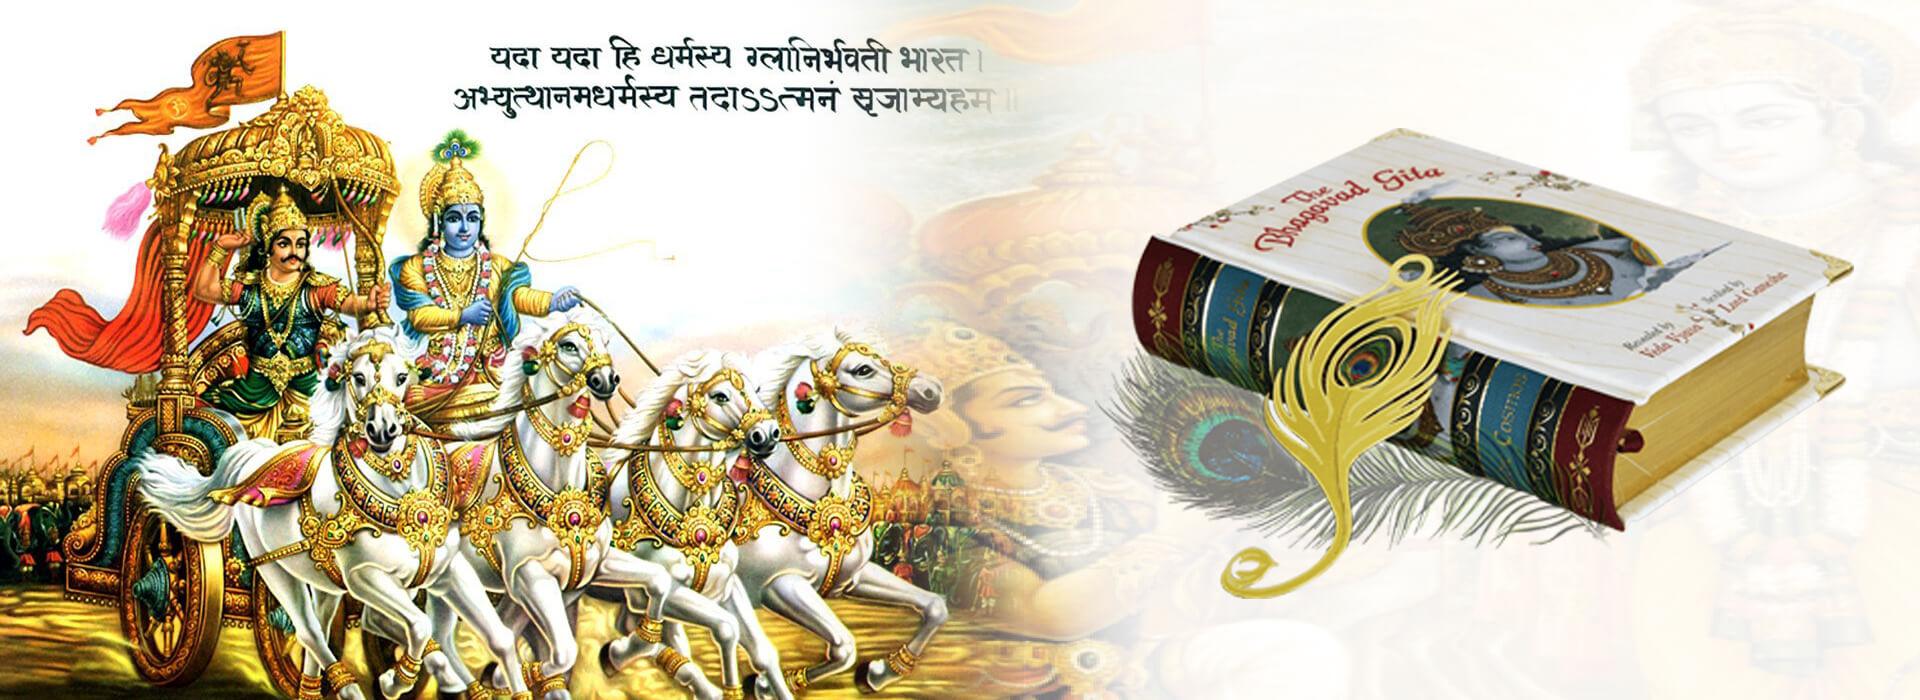 Gita sanjeevani -Bhgwad gita